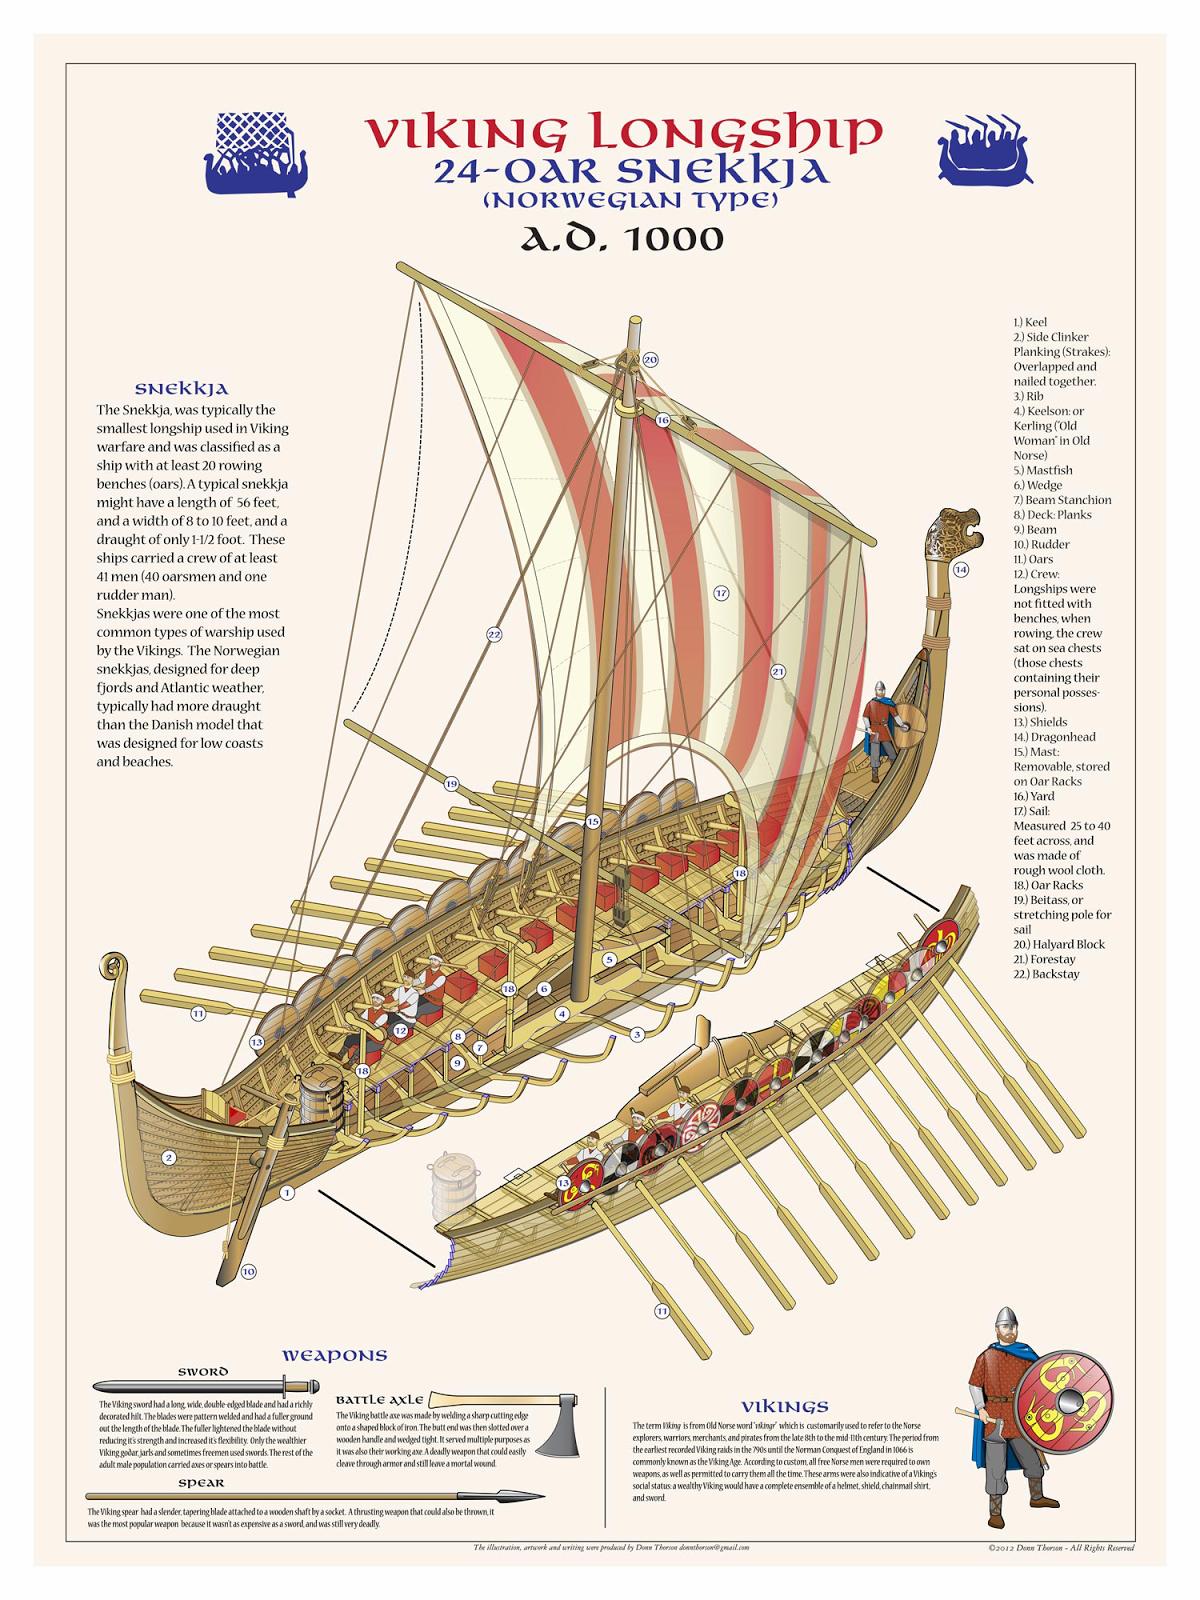 Drakkar Viking Ship 9th 13th Century With Images